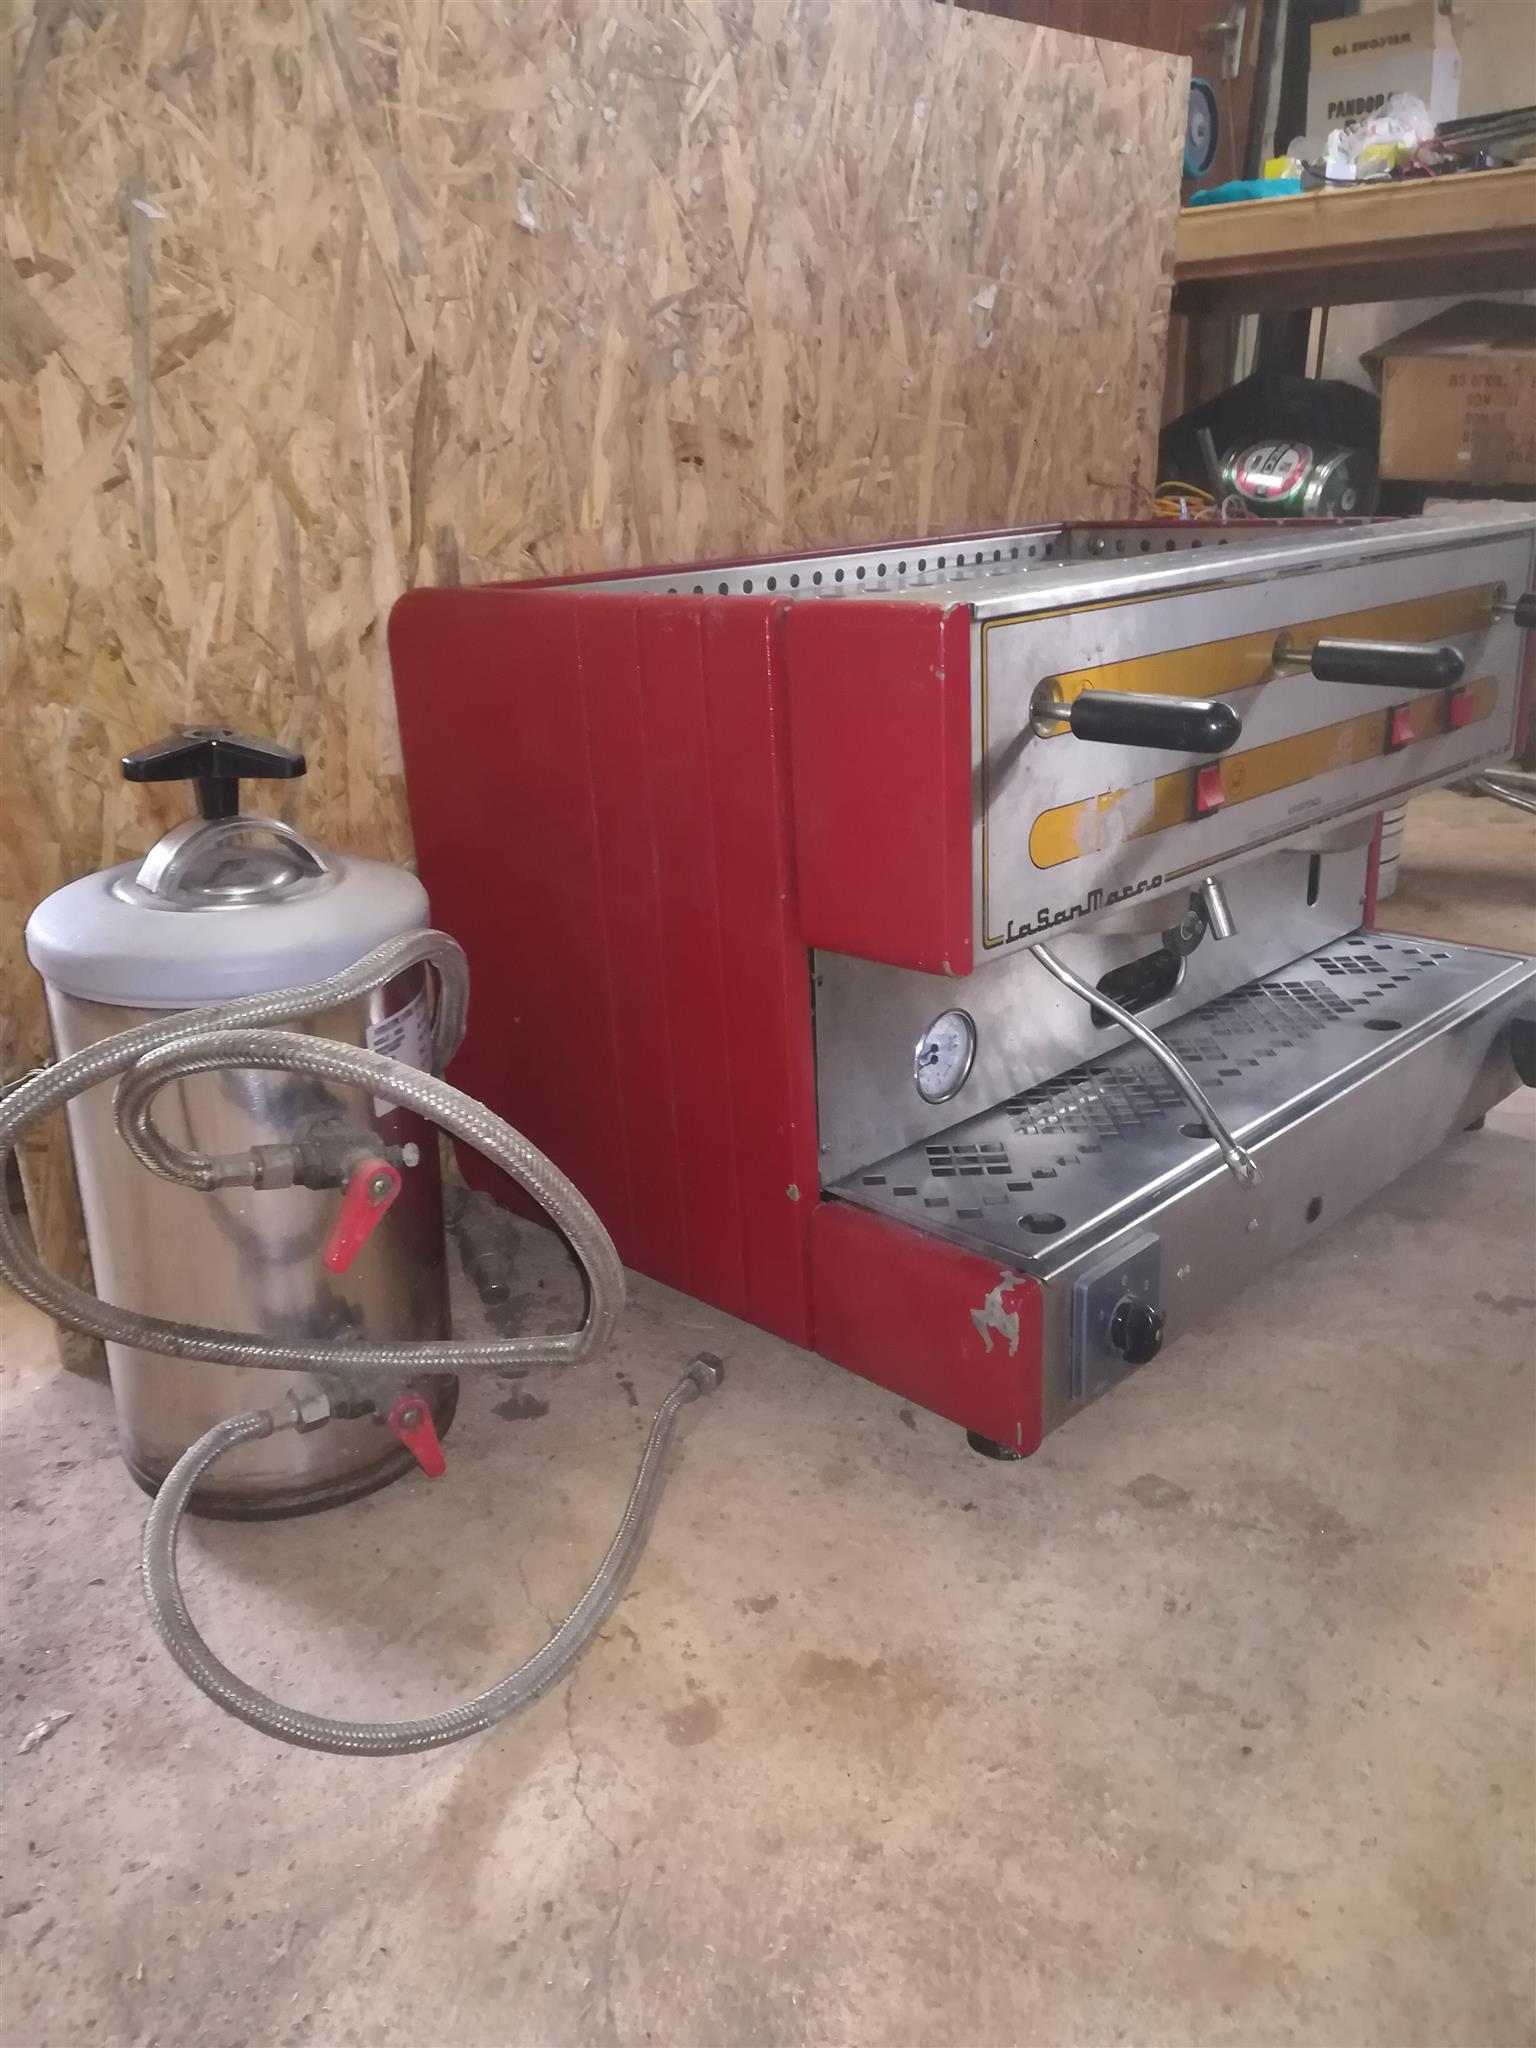 La San Marco 85-12-2 Espresso